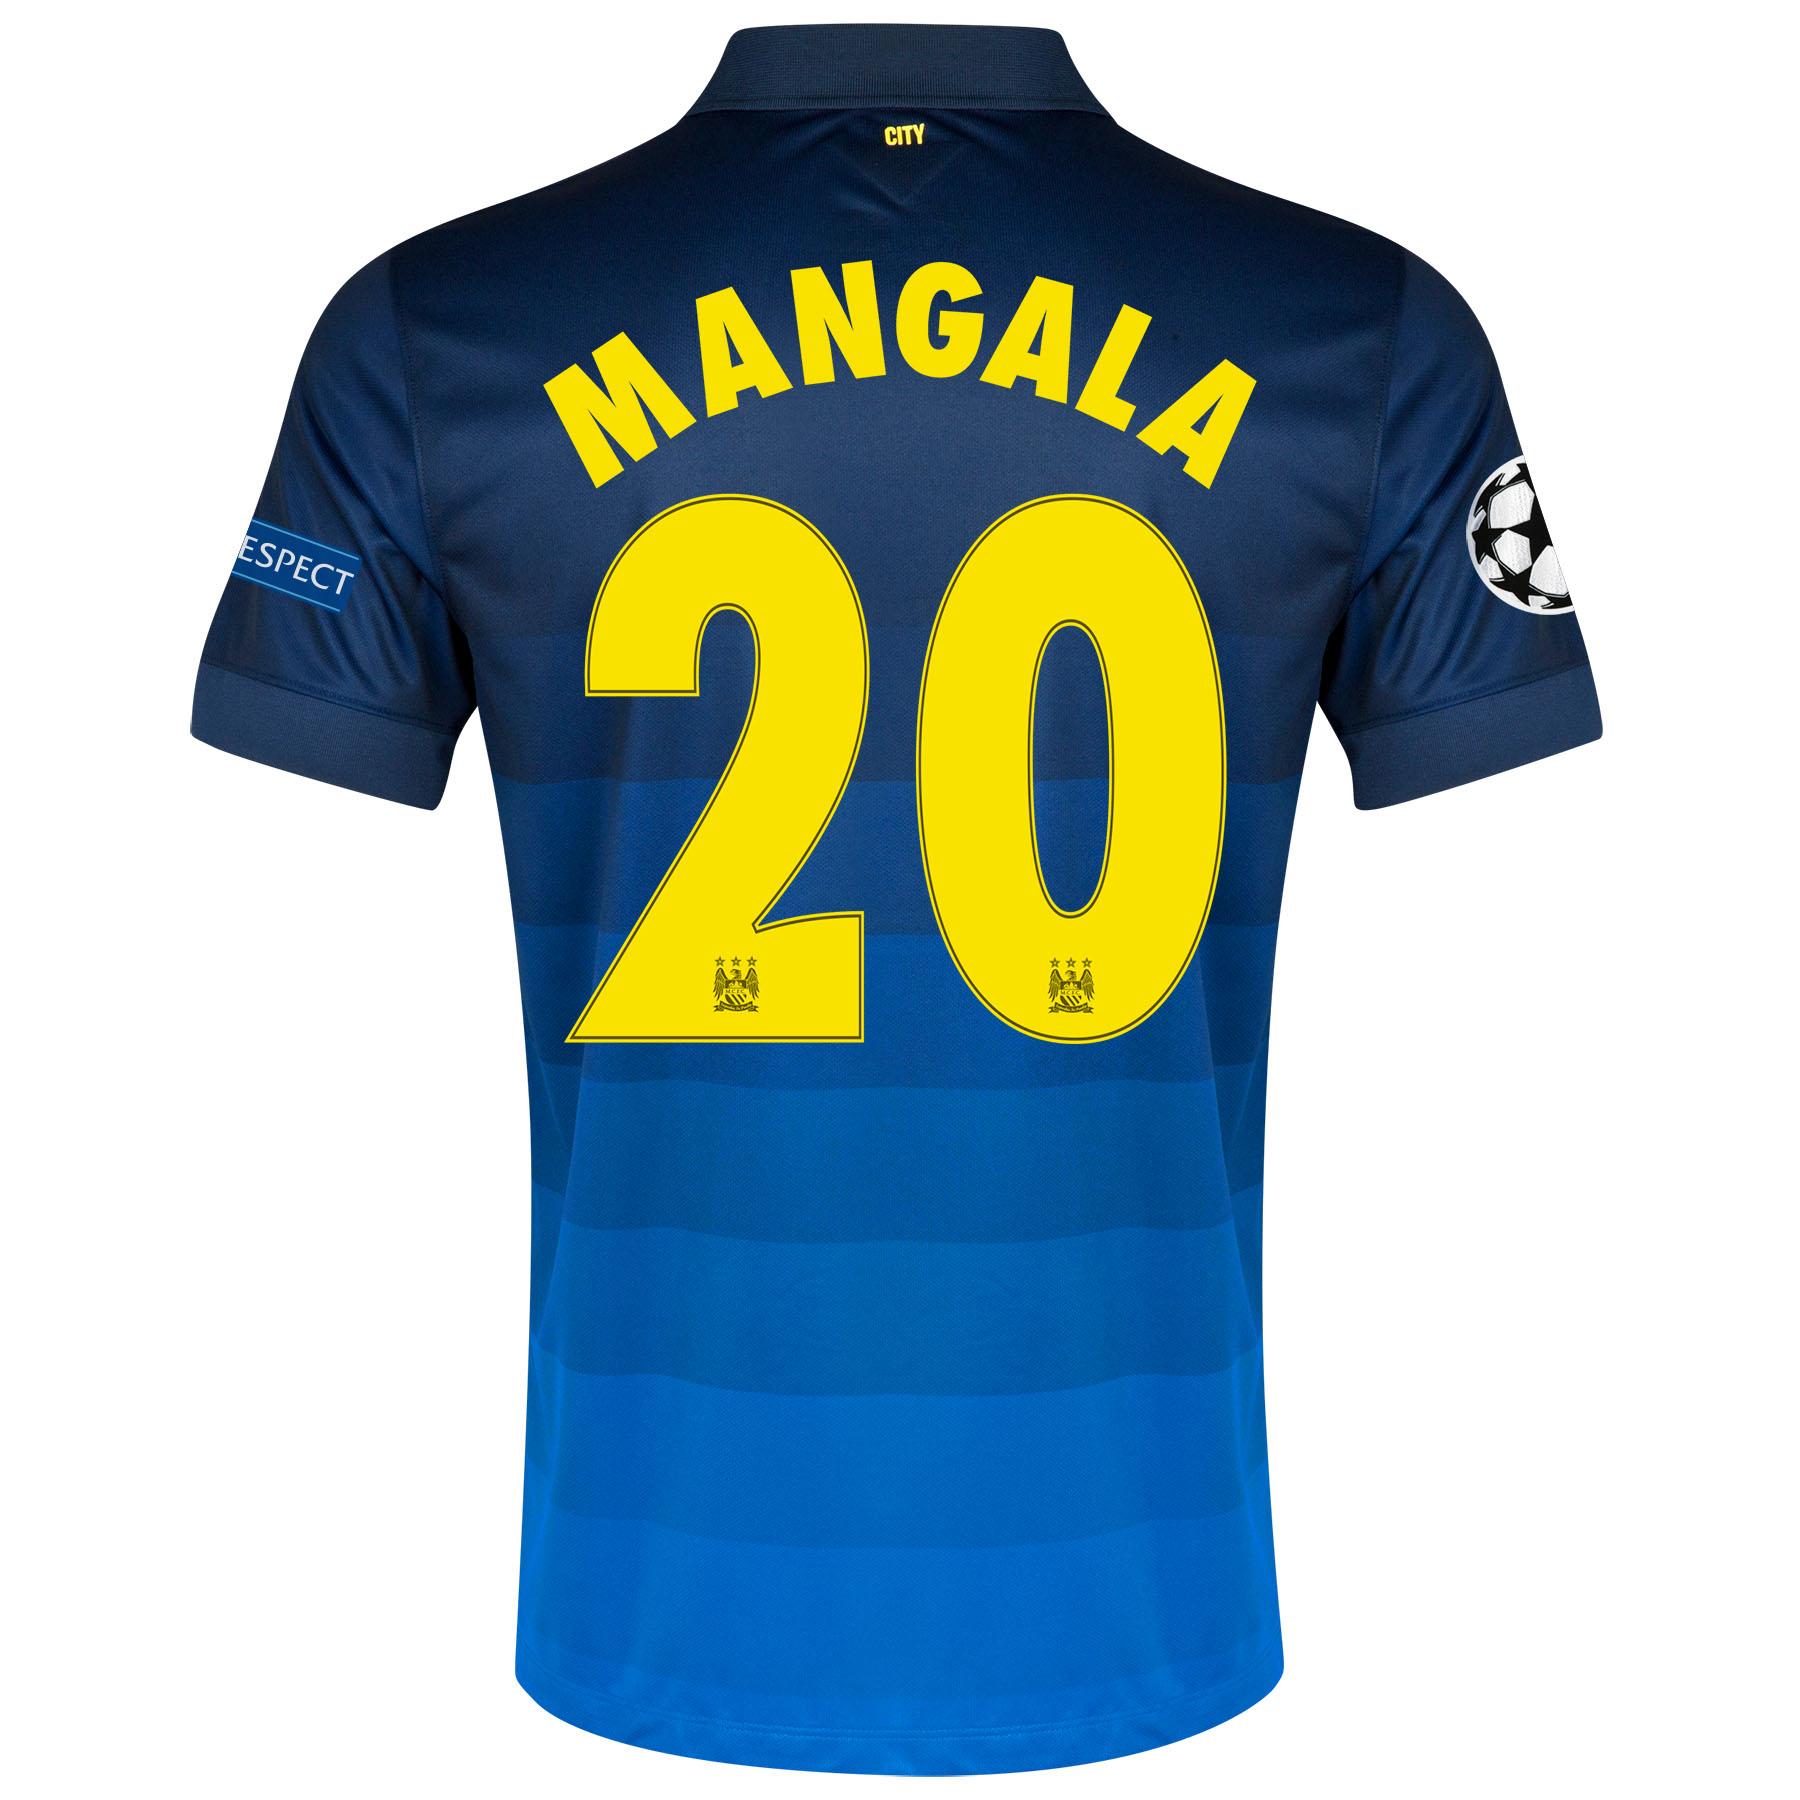 Manchester City UEFA Champions League Away Shirt 2014/15 with Mangala 20 printing